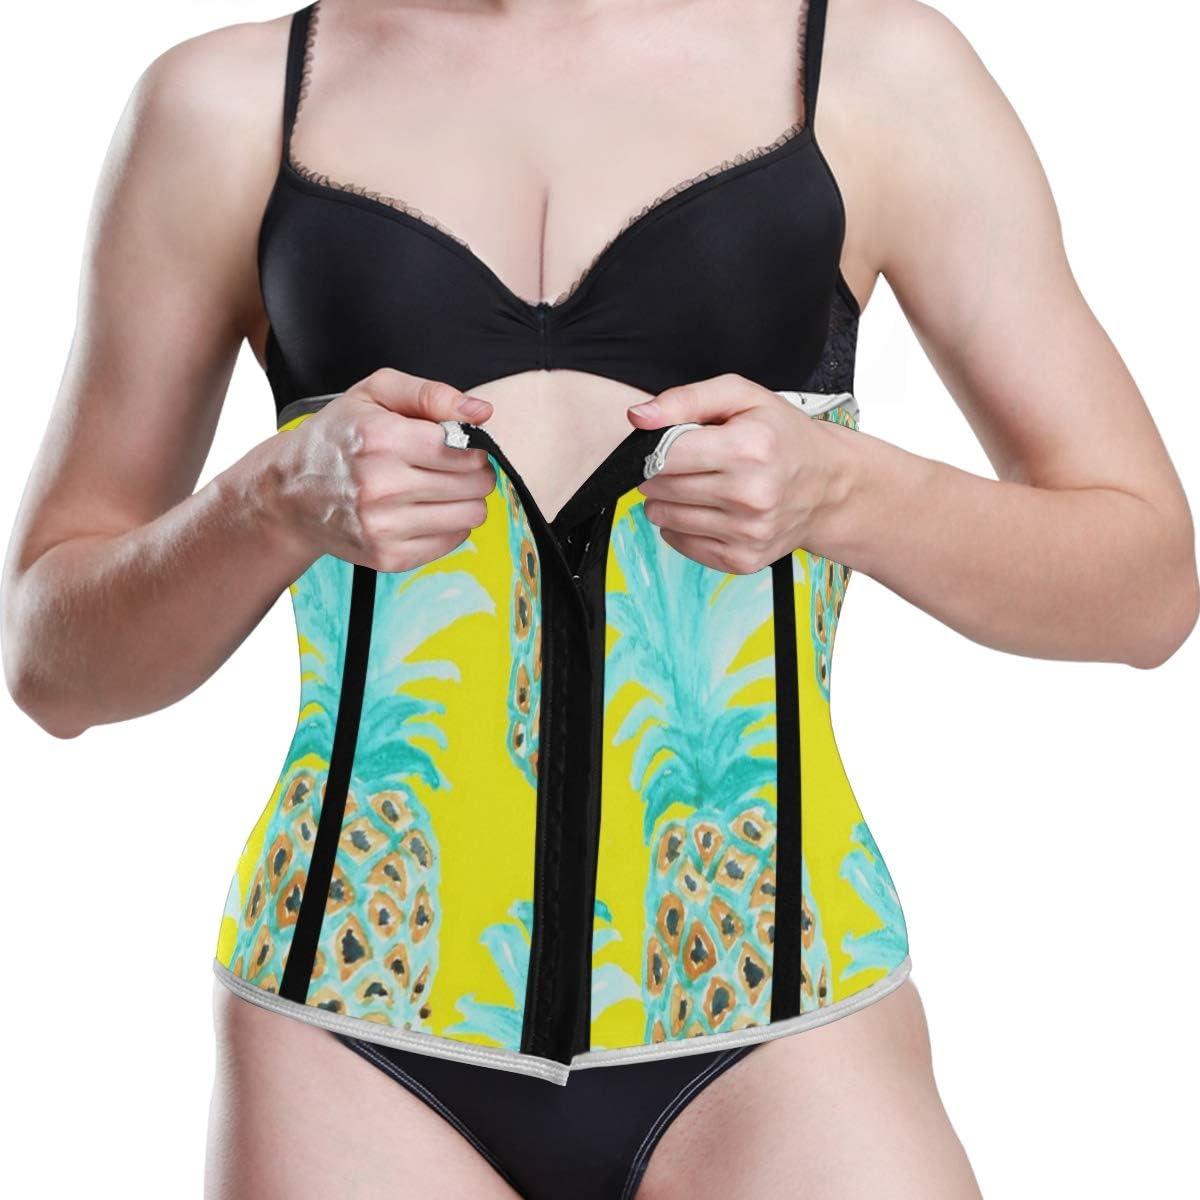 Trimmer Belt Wrap Stomach Slim Fat Burn Weight Loss Body Shaper GYM Pineapple